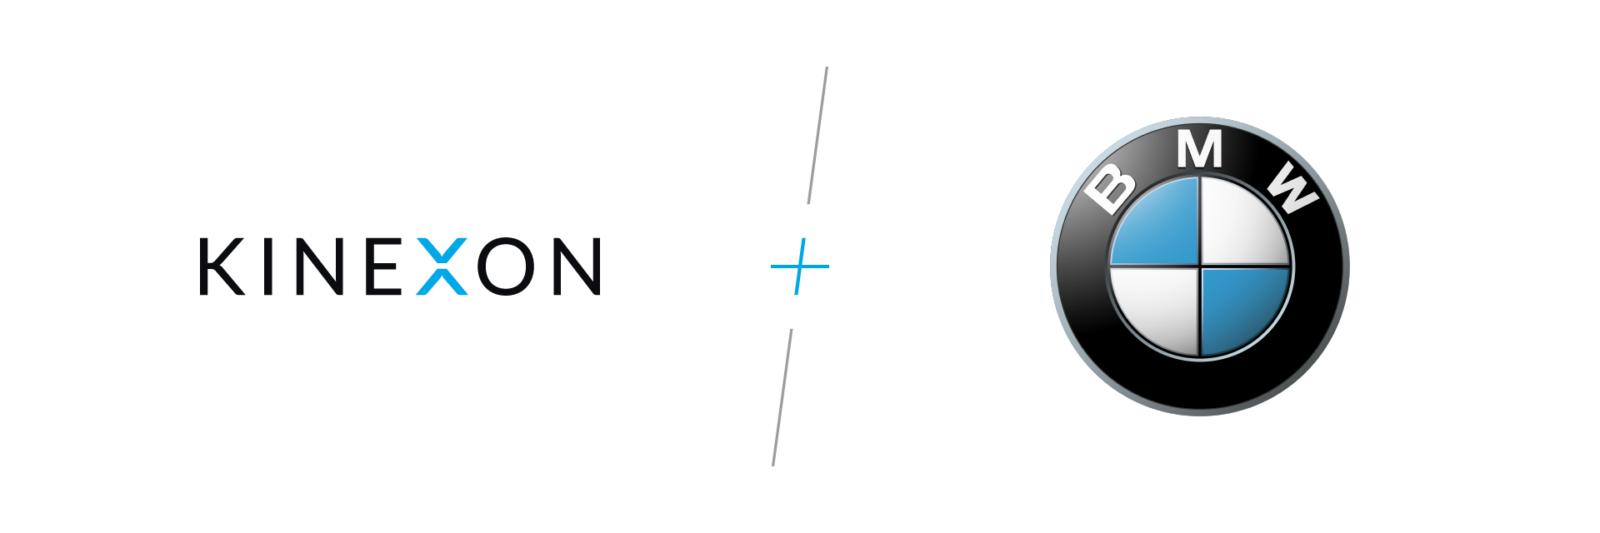 KINEXON X BMW